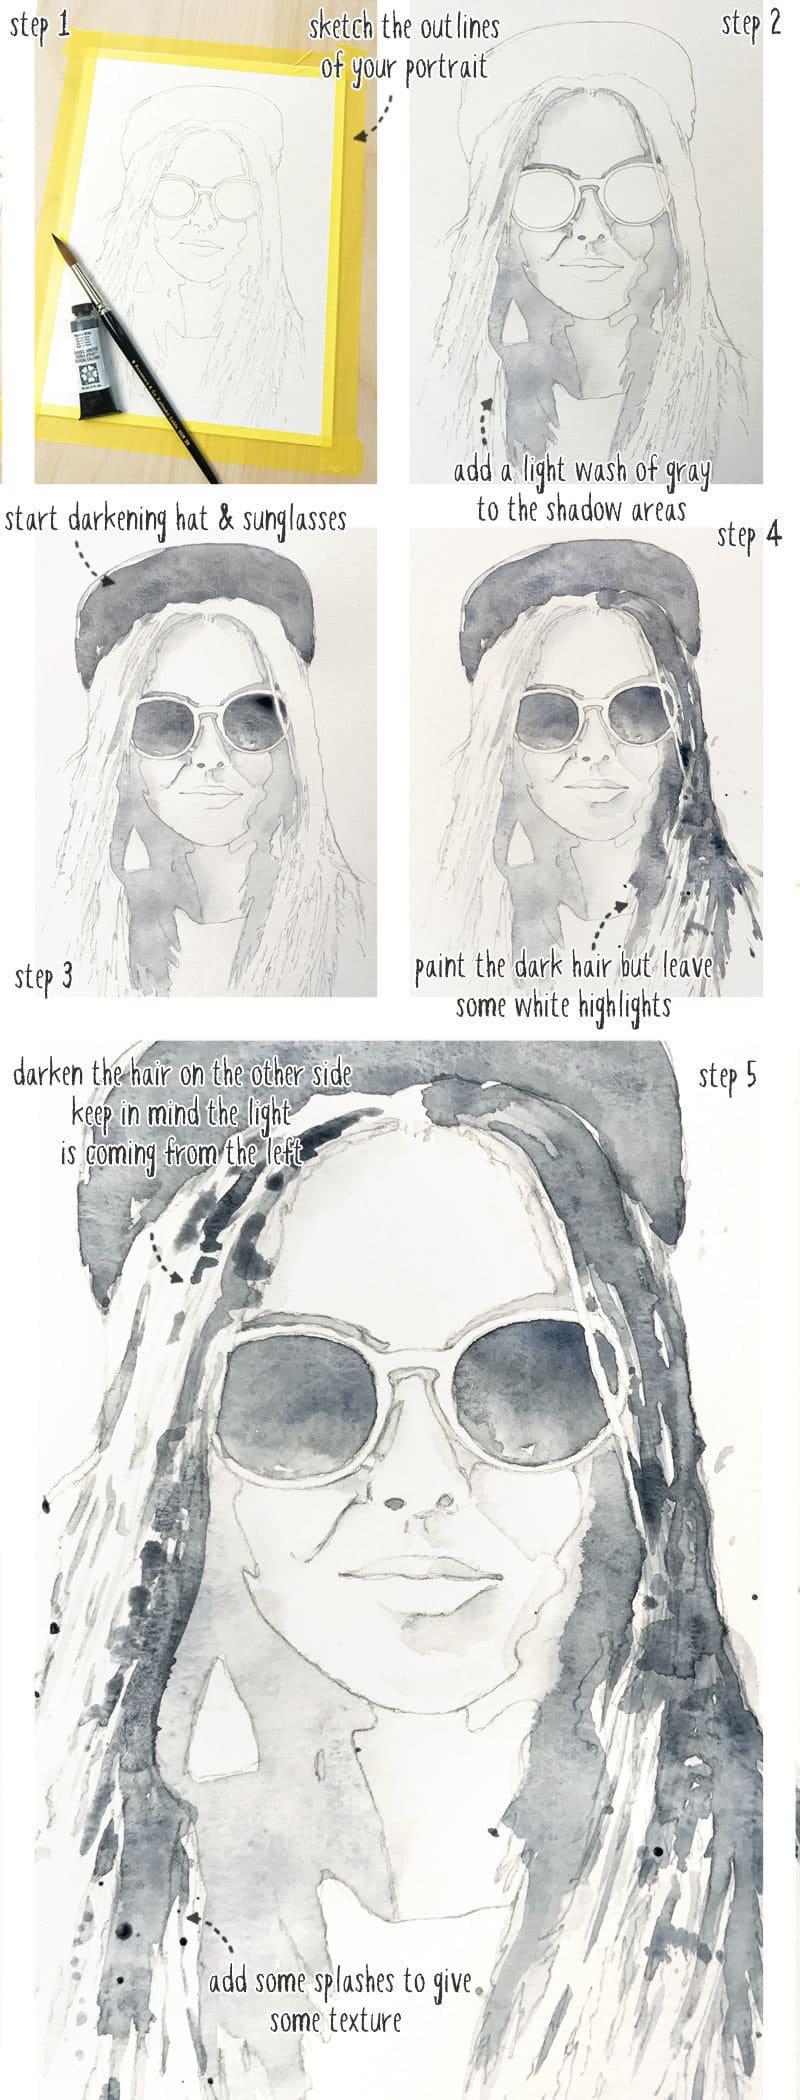 monochrome watercolor portrait tutorial step by step